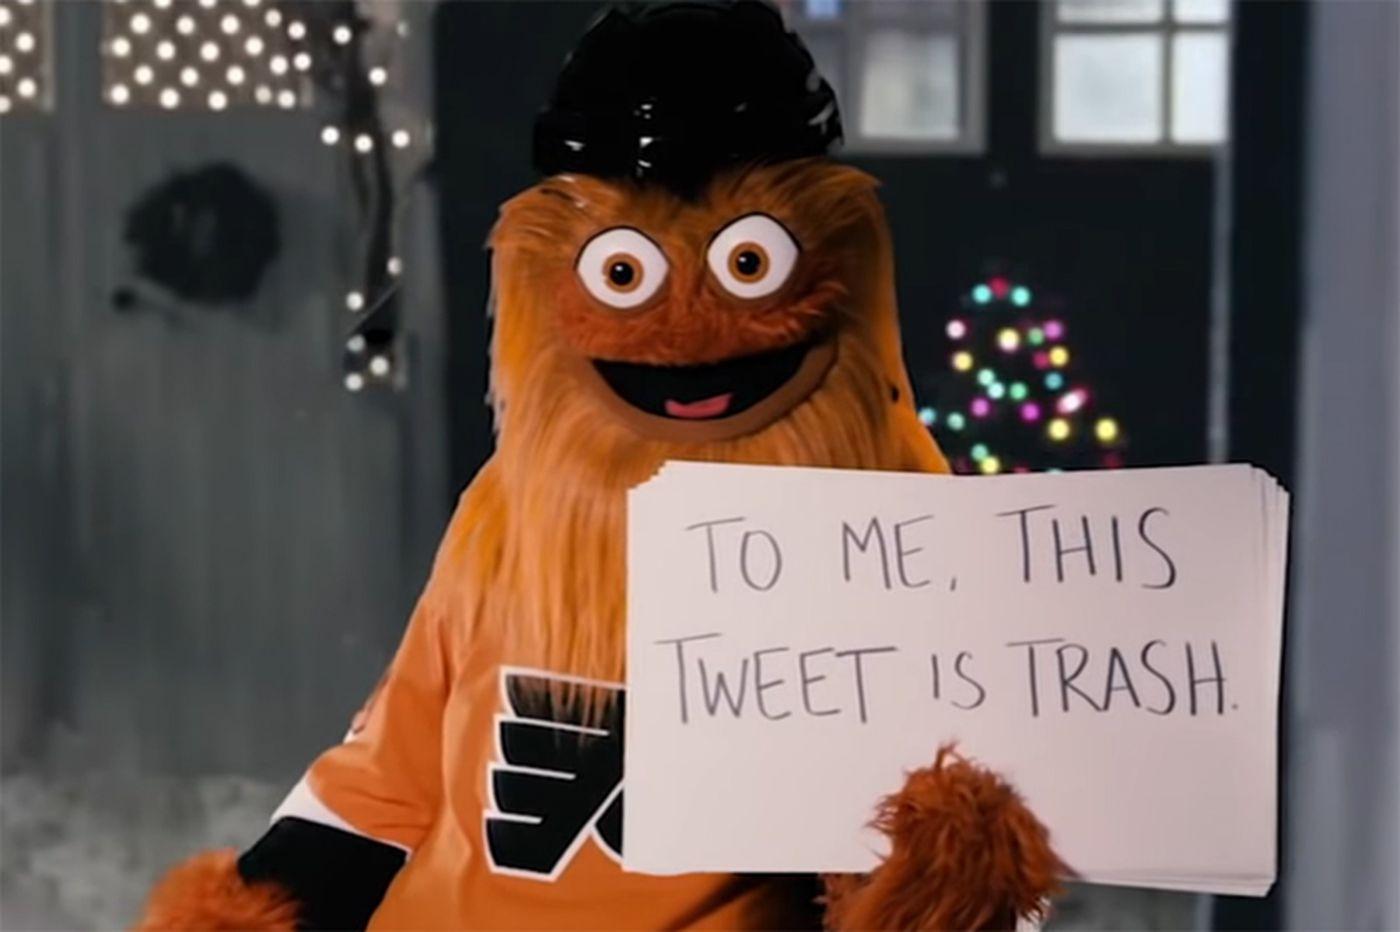 Gritty mansplains to ESPN's Katie Nolan in 'Love Actually' parody